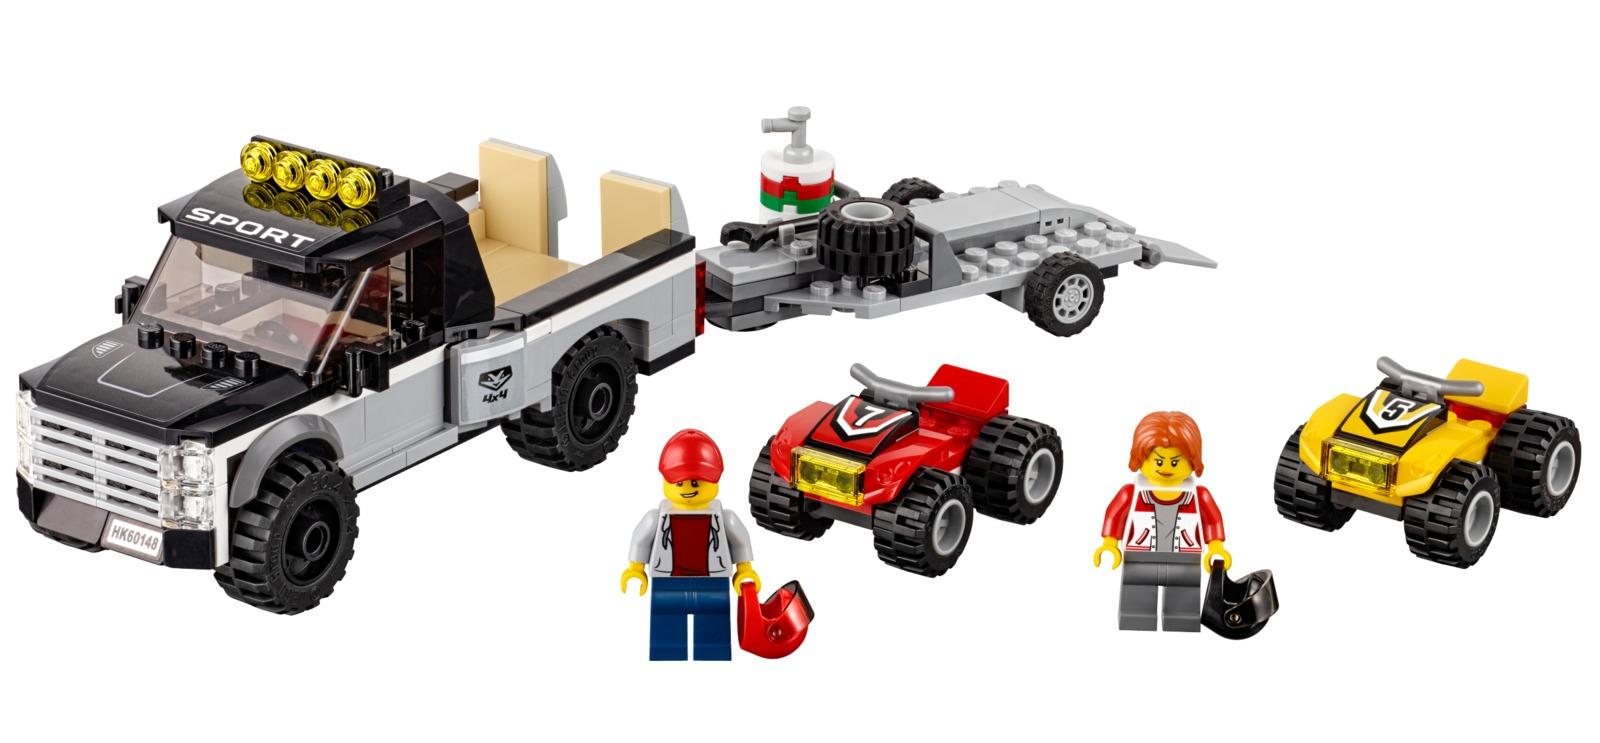 LEGO City: ATV Race Team (60148) image